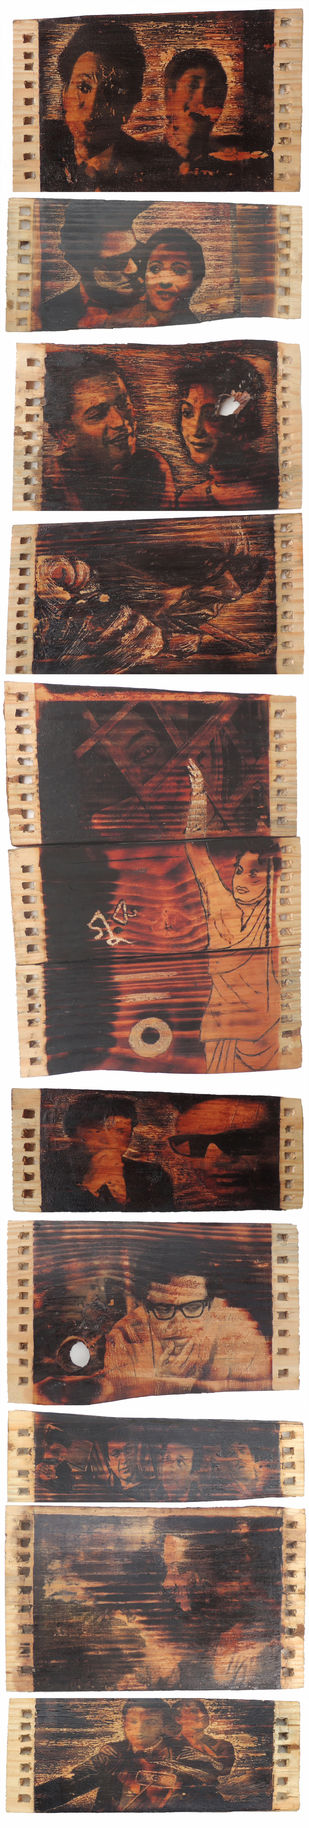 Guru by Sampurna Naskar, Conceptual Painting, Mixed Media on Wood,